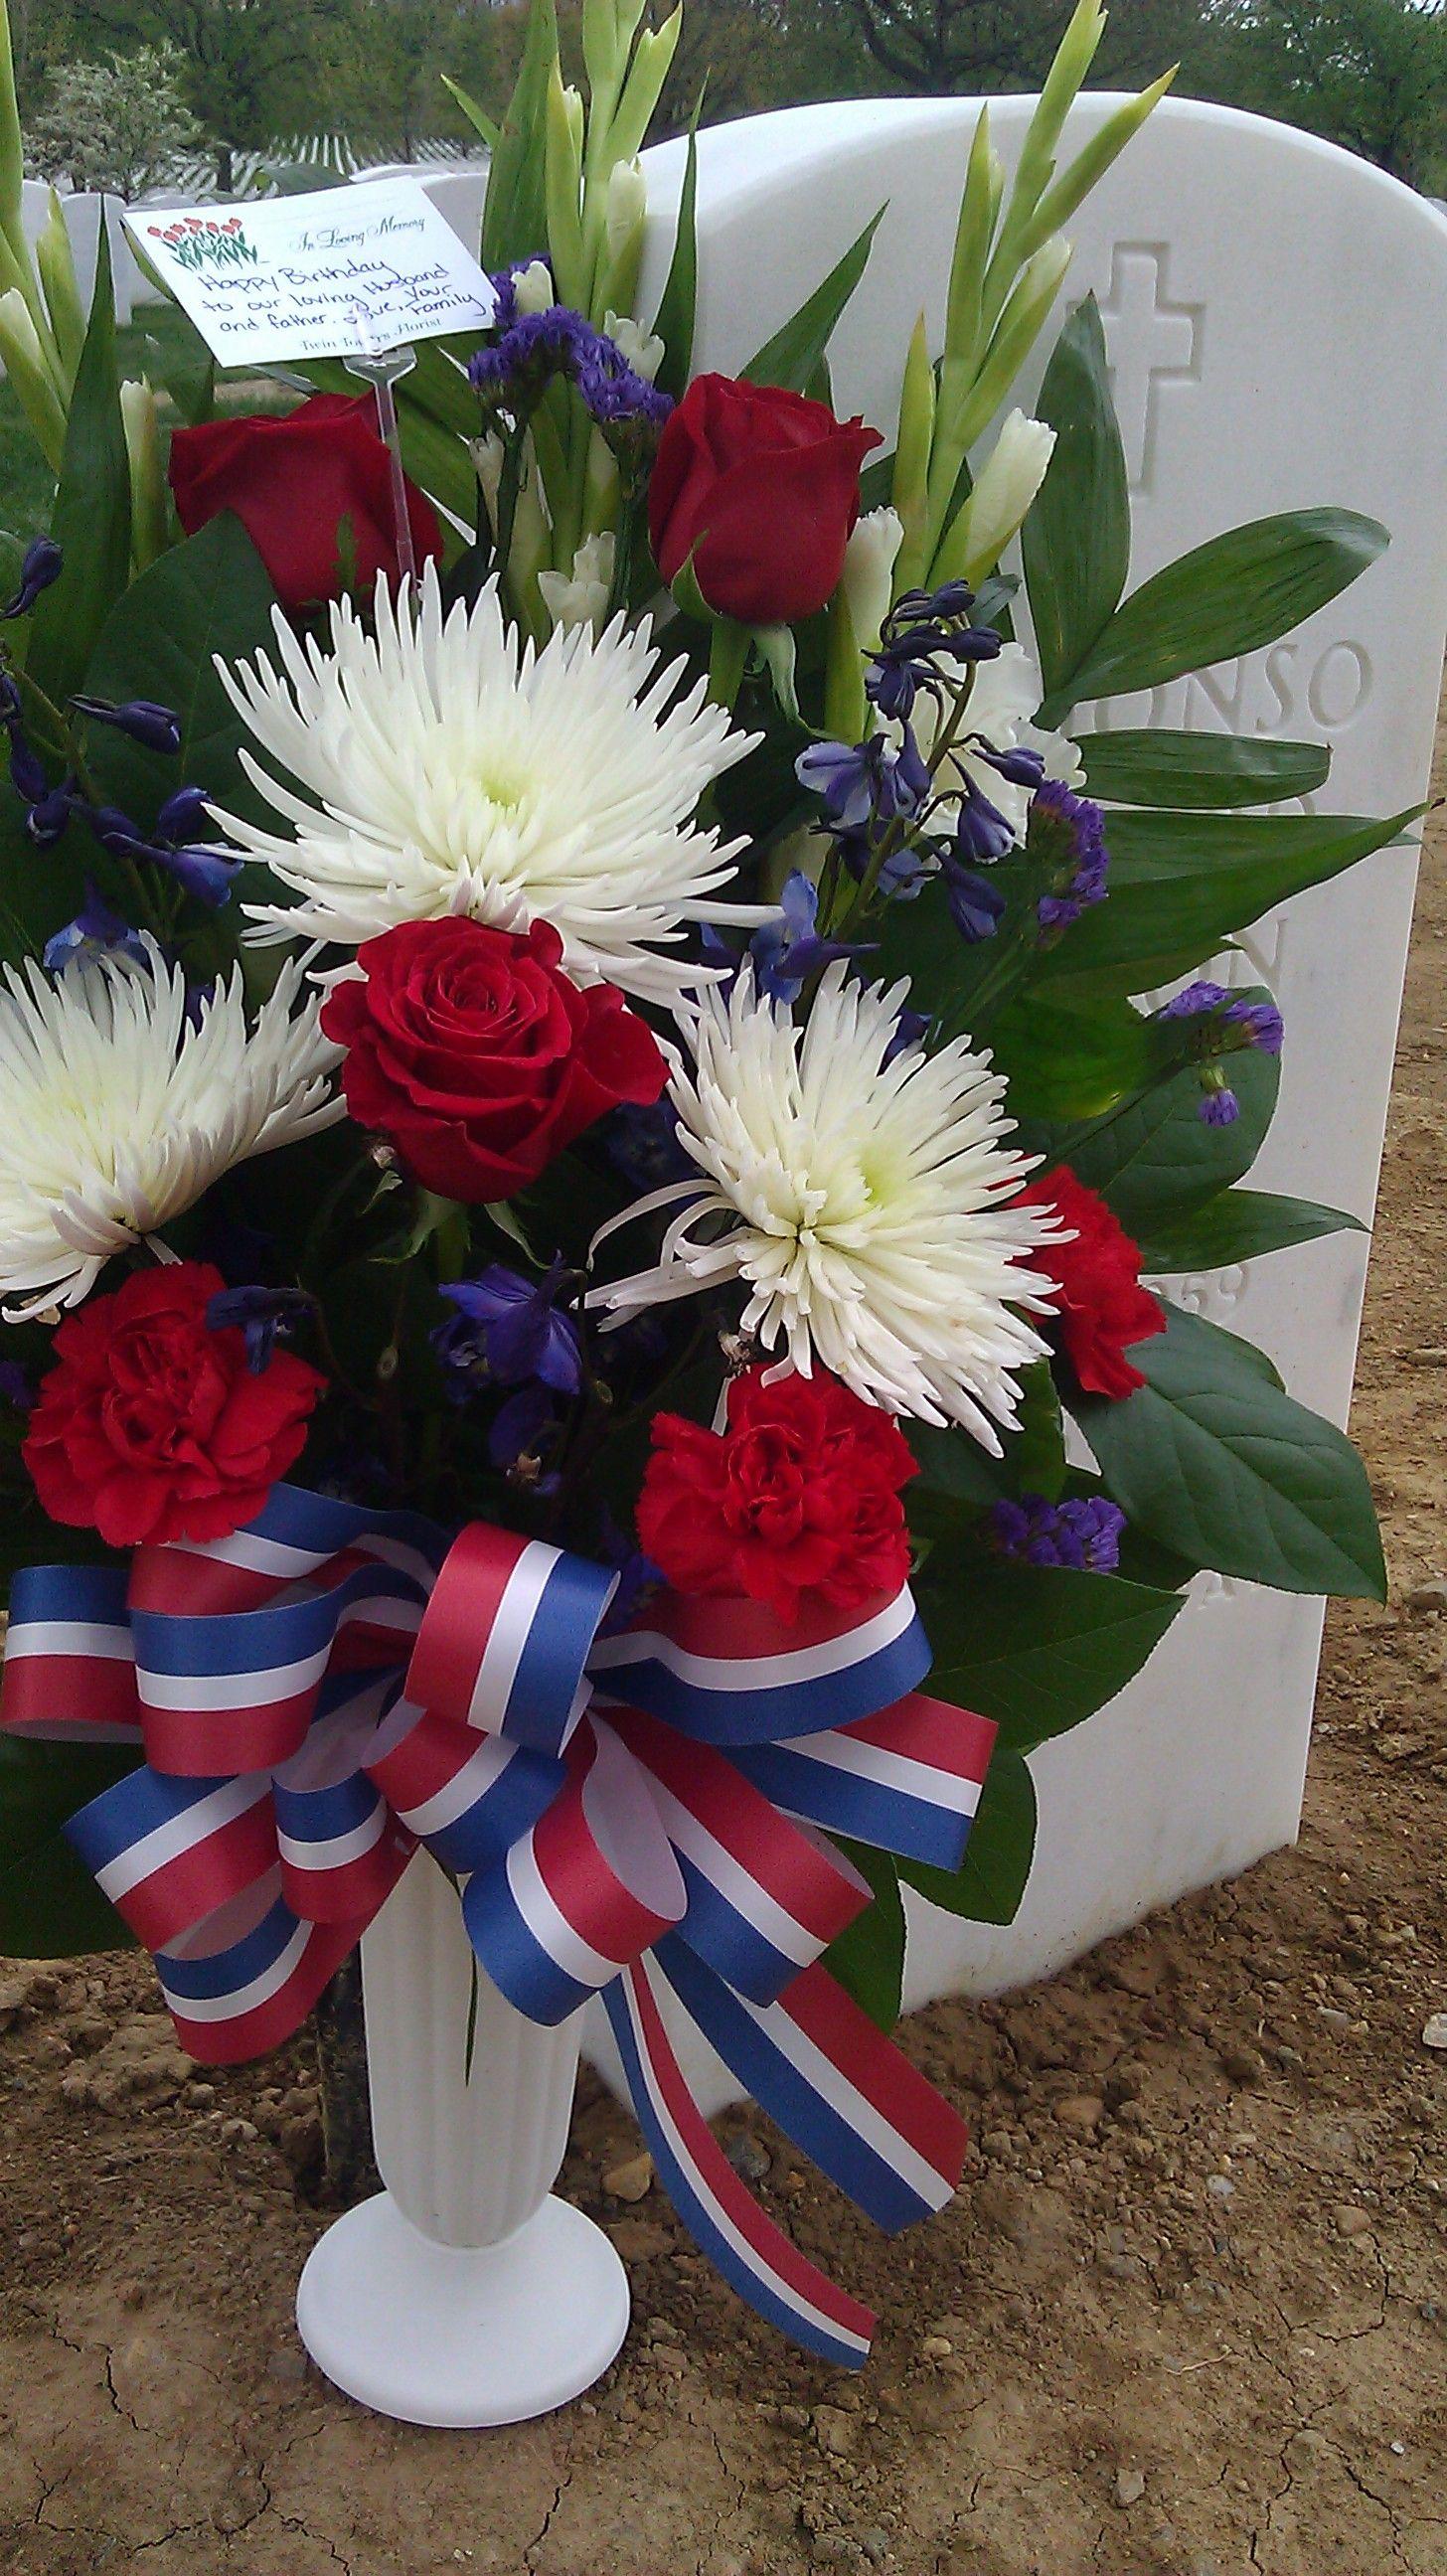 Flowers for my husband my hero my soul mate one of our nations flowers for my husband my hero my soul mate one of our nations heroes i love you i miss you izmirmasajfo